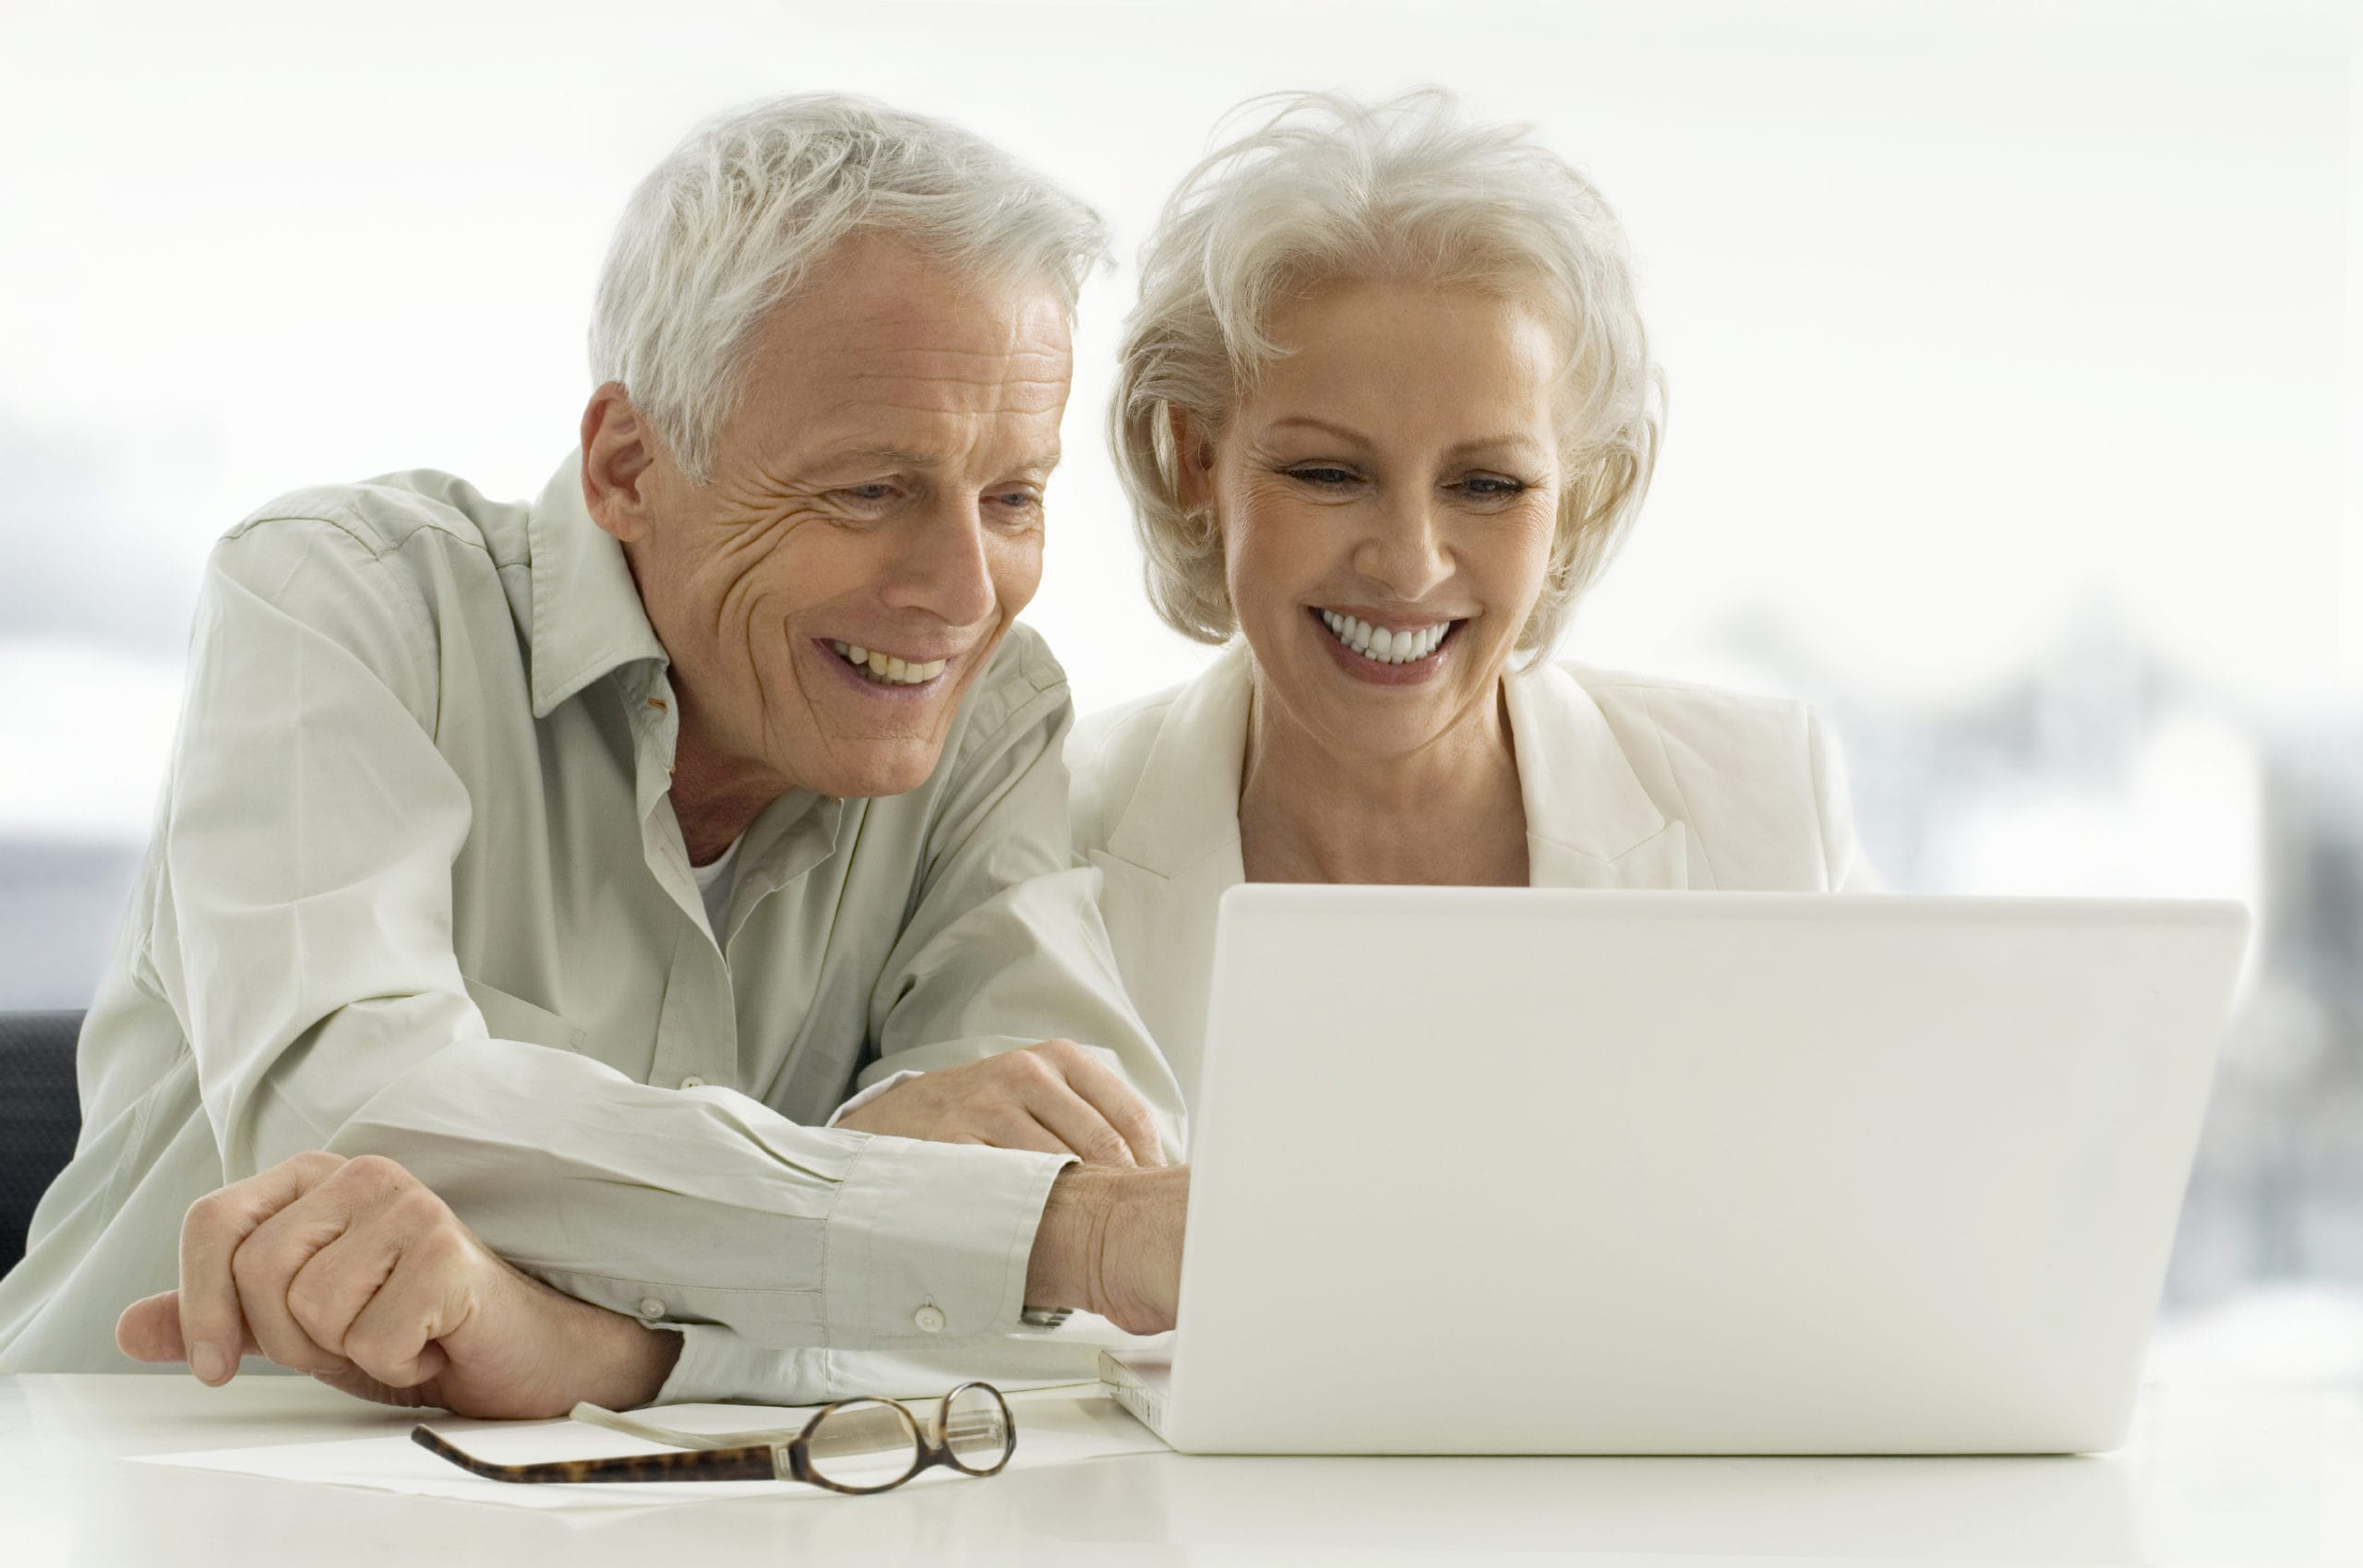 marketing to seniors